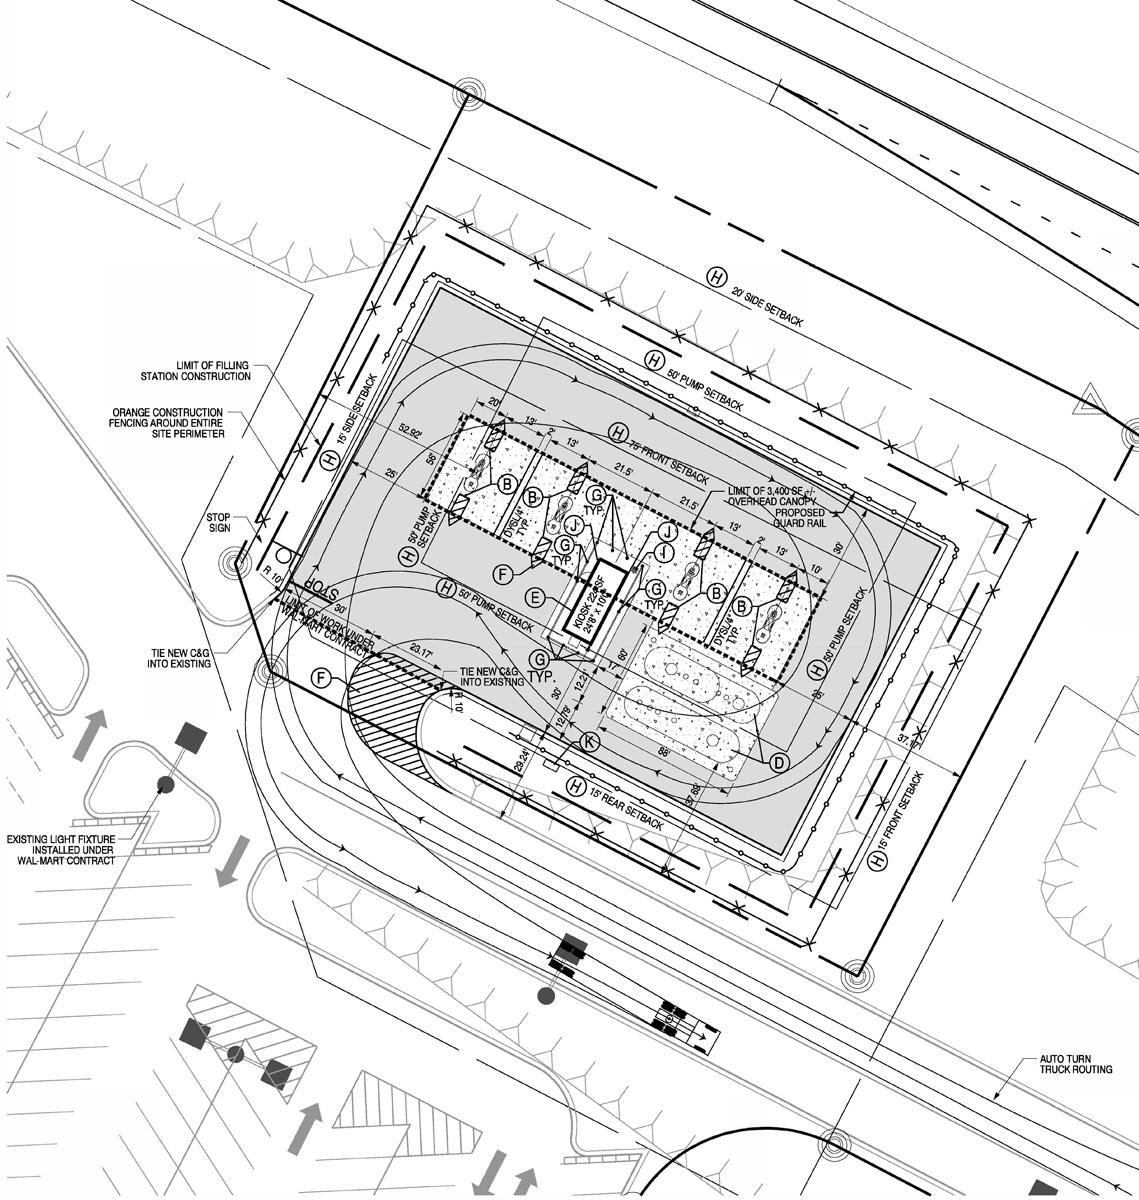 walmart-gas-station-site-plan-4.jpg